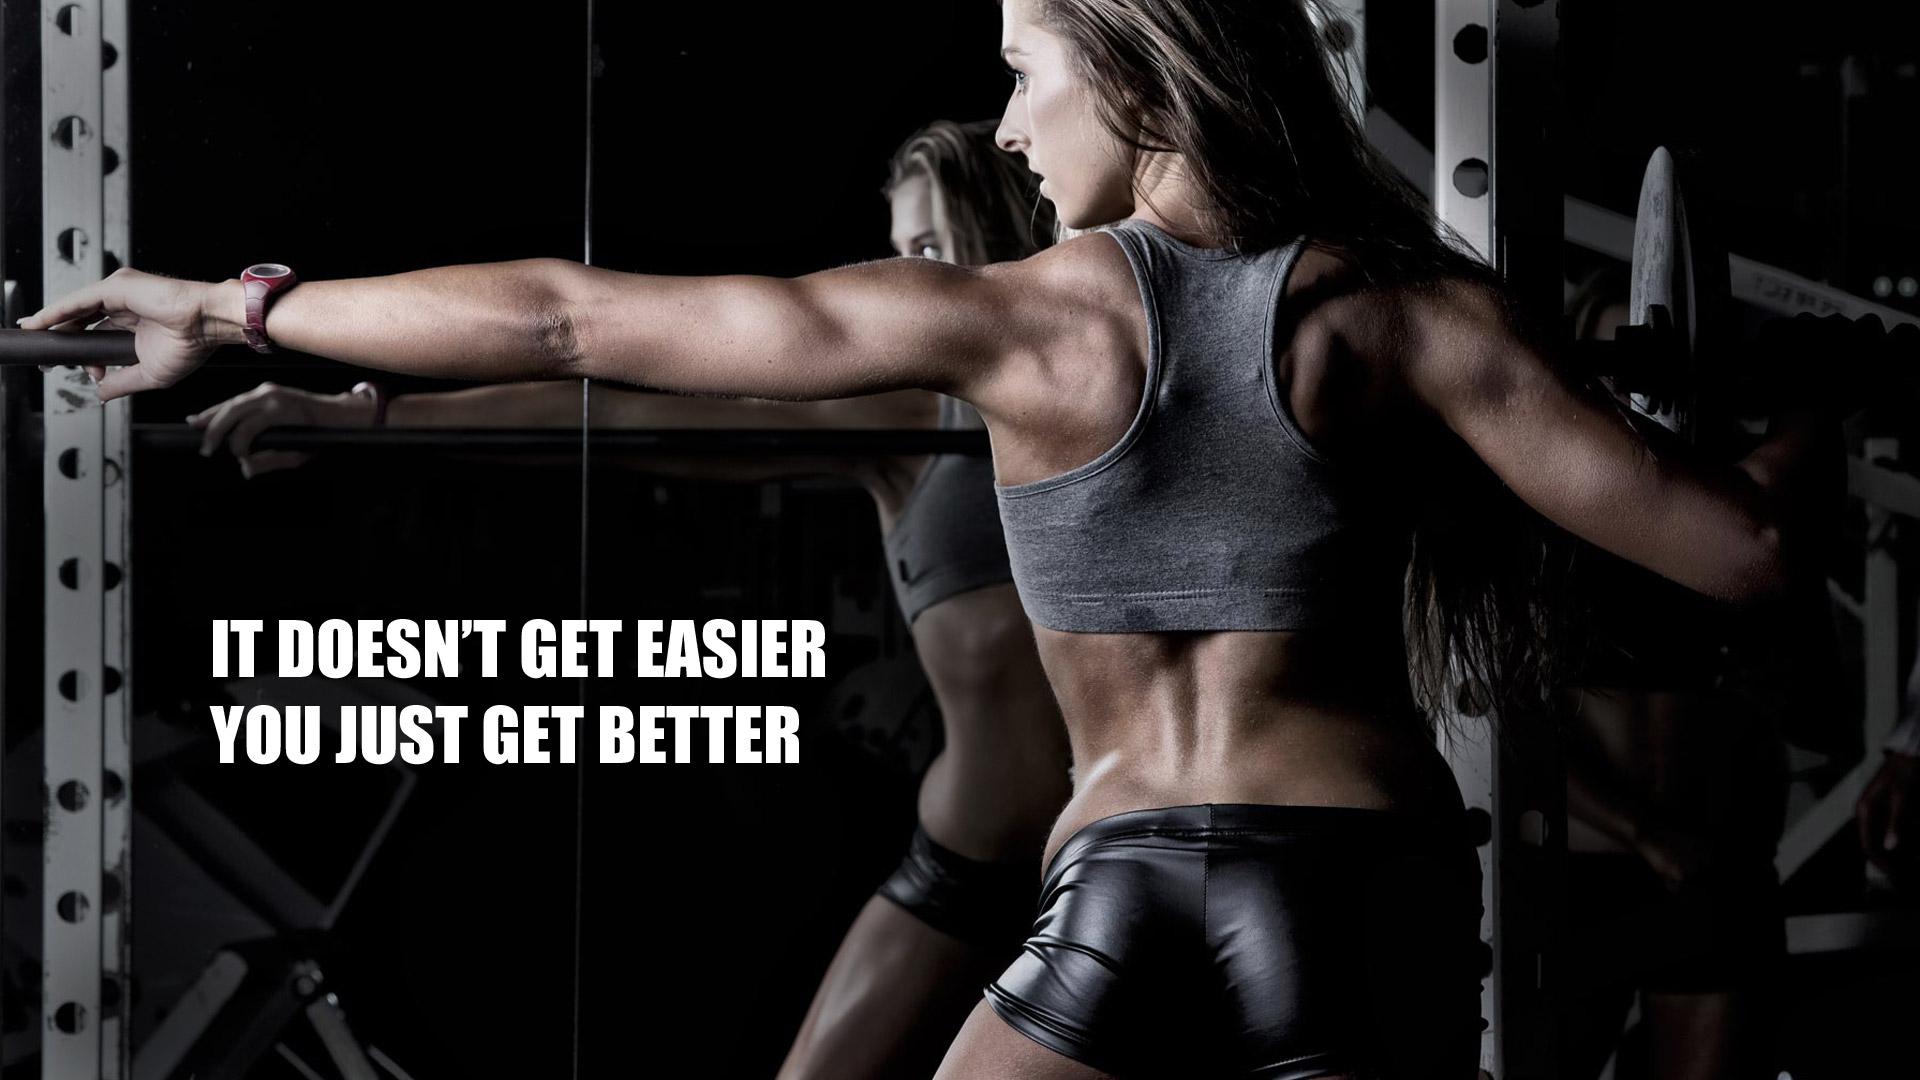 motivational-wallpaper-Motivational-Wallpaper-Workout